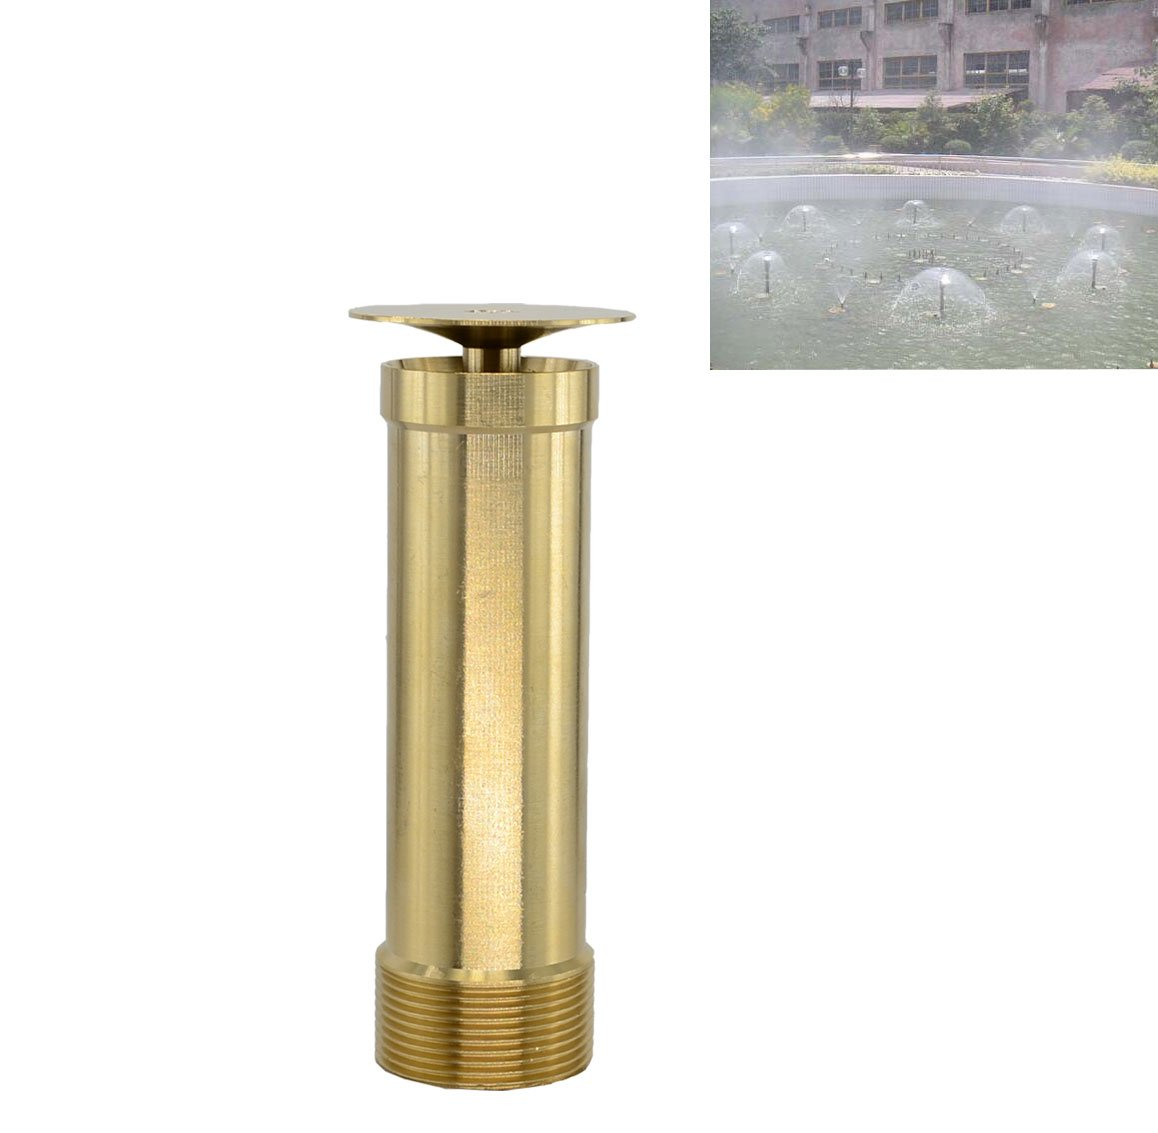 "Brass Column Garden Square Fireworks Pool Pond Adjustable Fountain Nozzle Sprinkler Spray Head SSH335 (2"")"